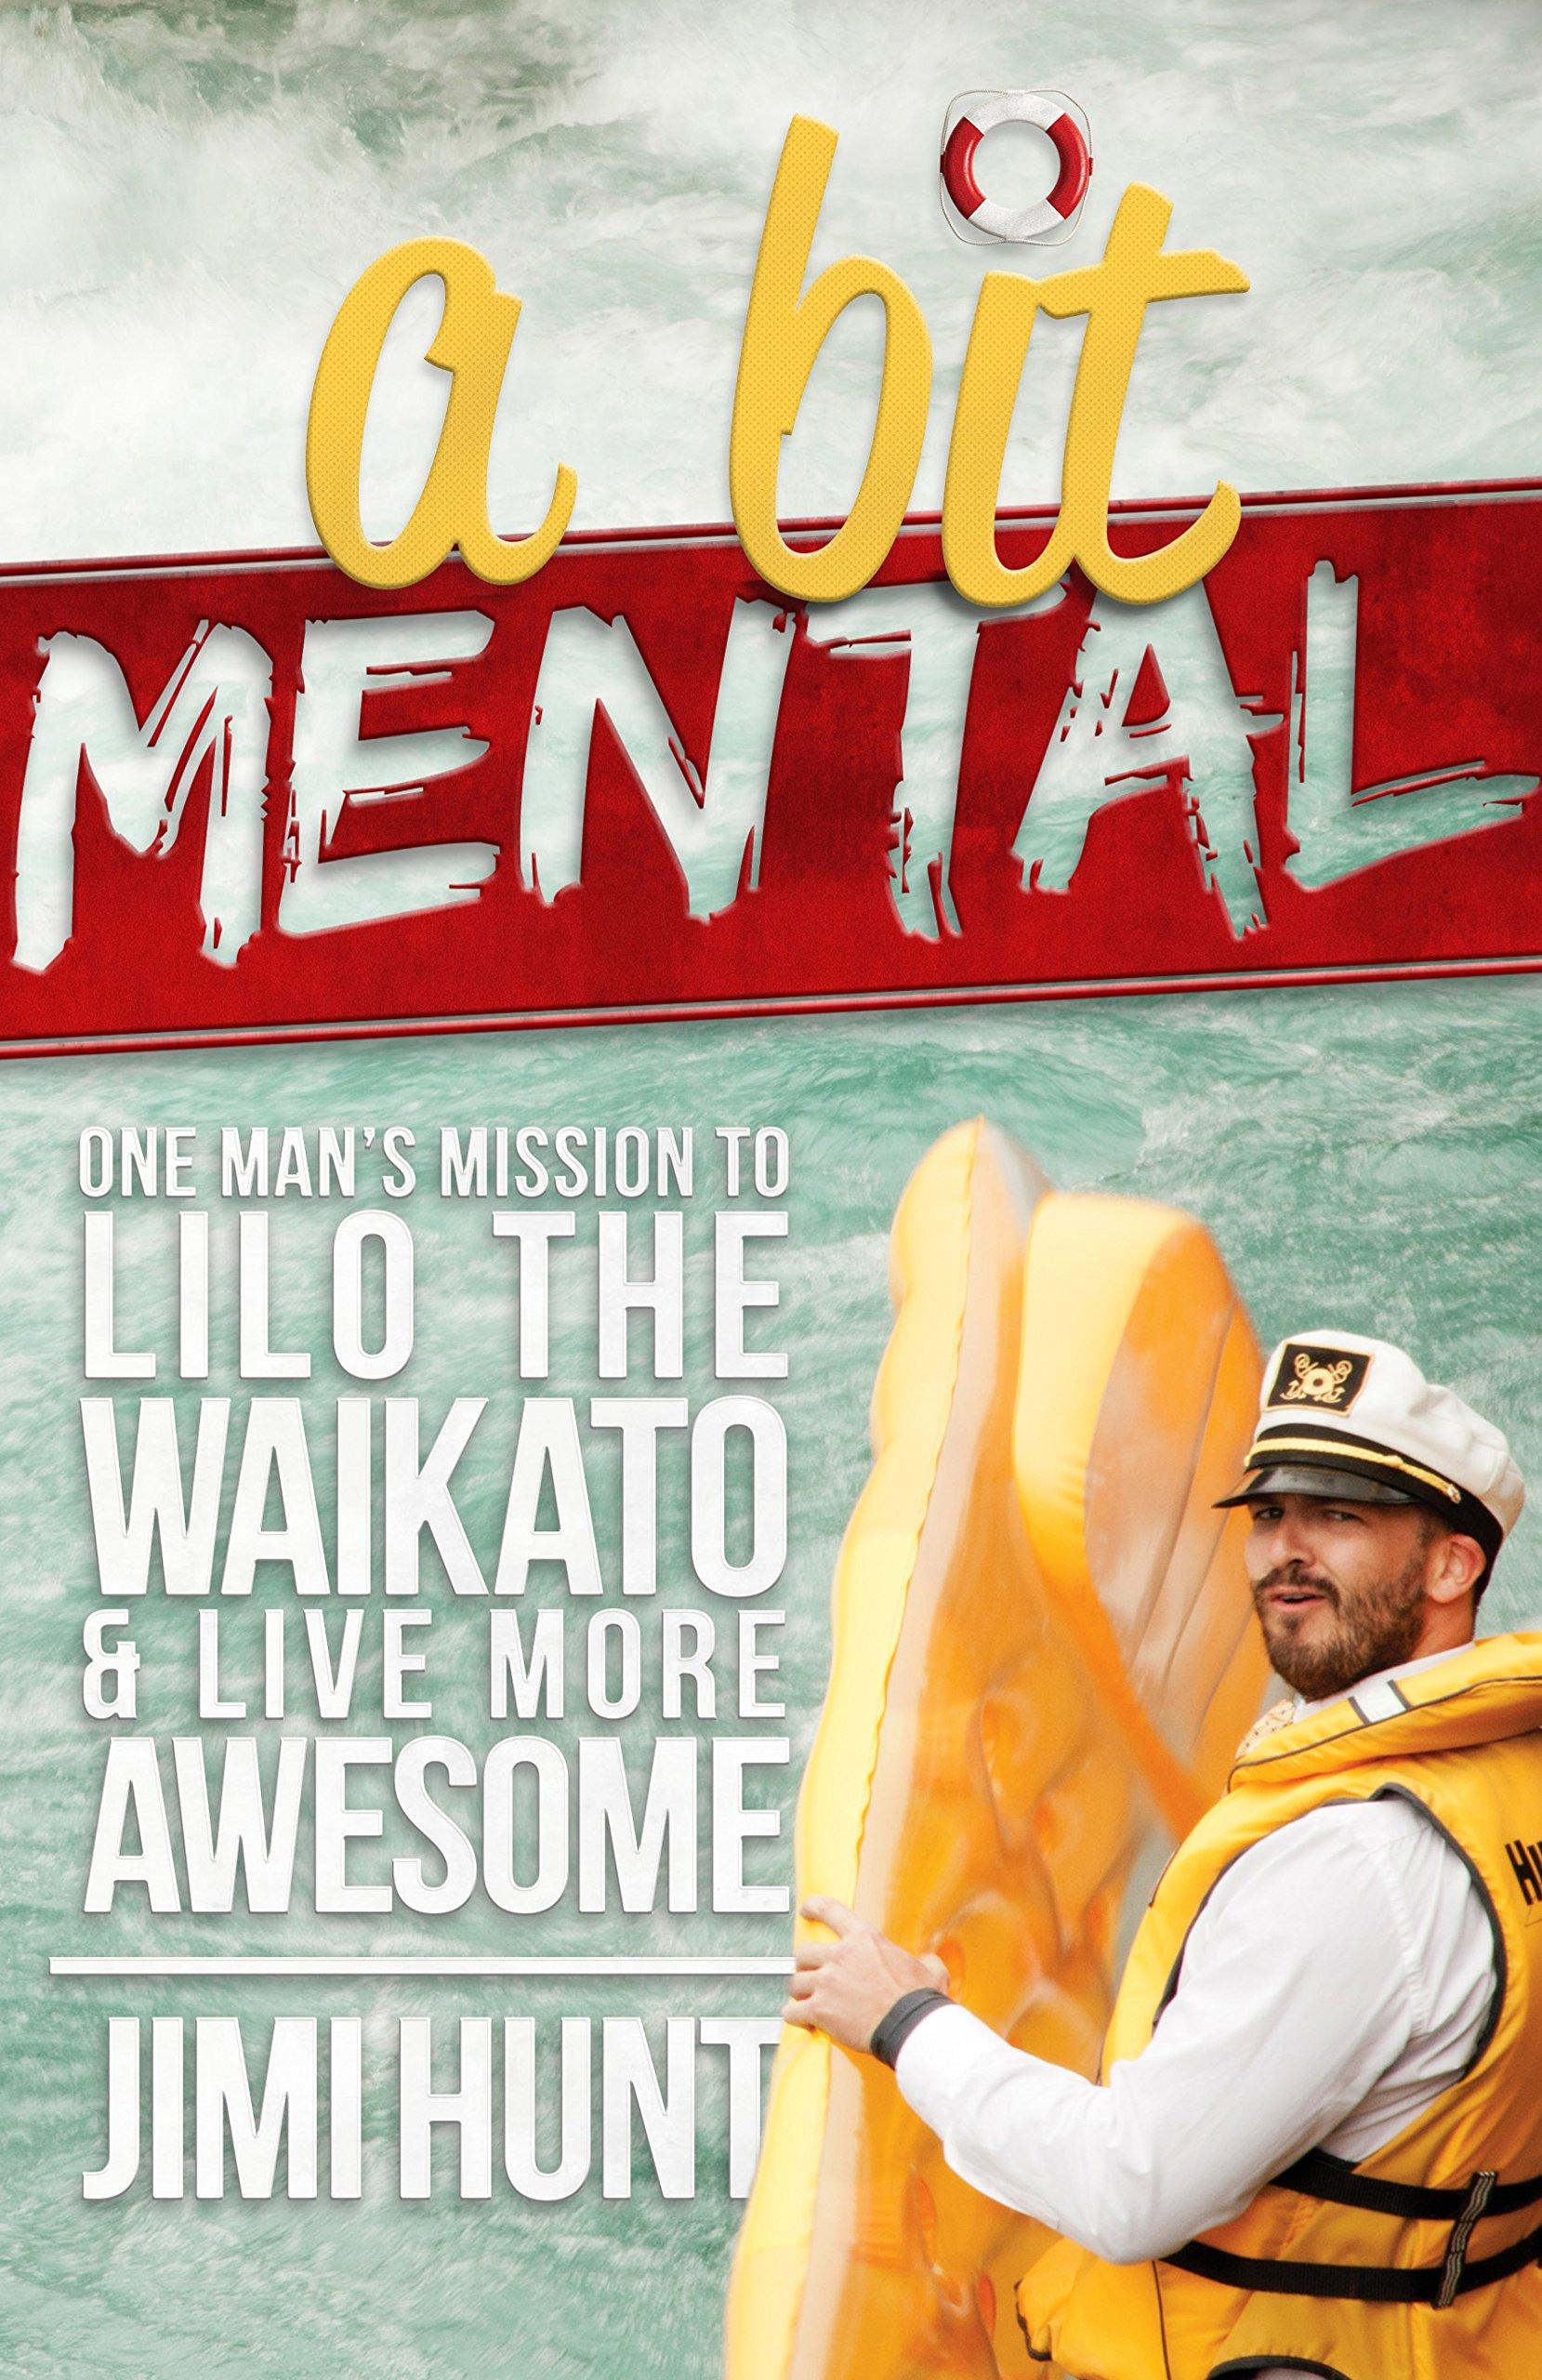 A Bit Mental: One Man's Mission to Lilo the Waikato pdf